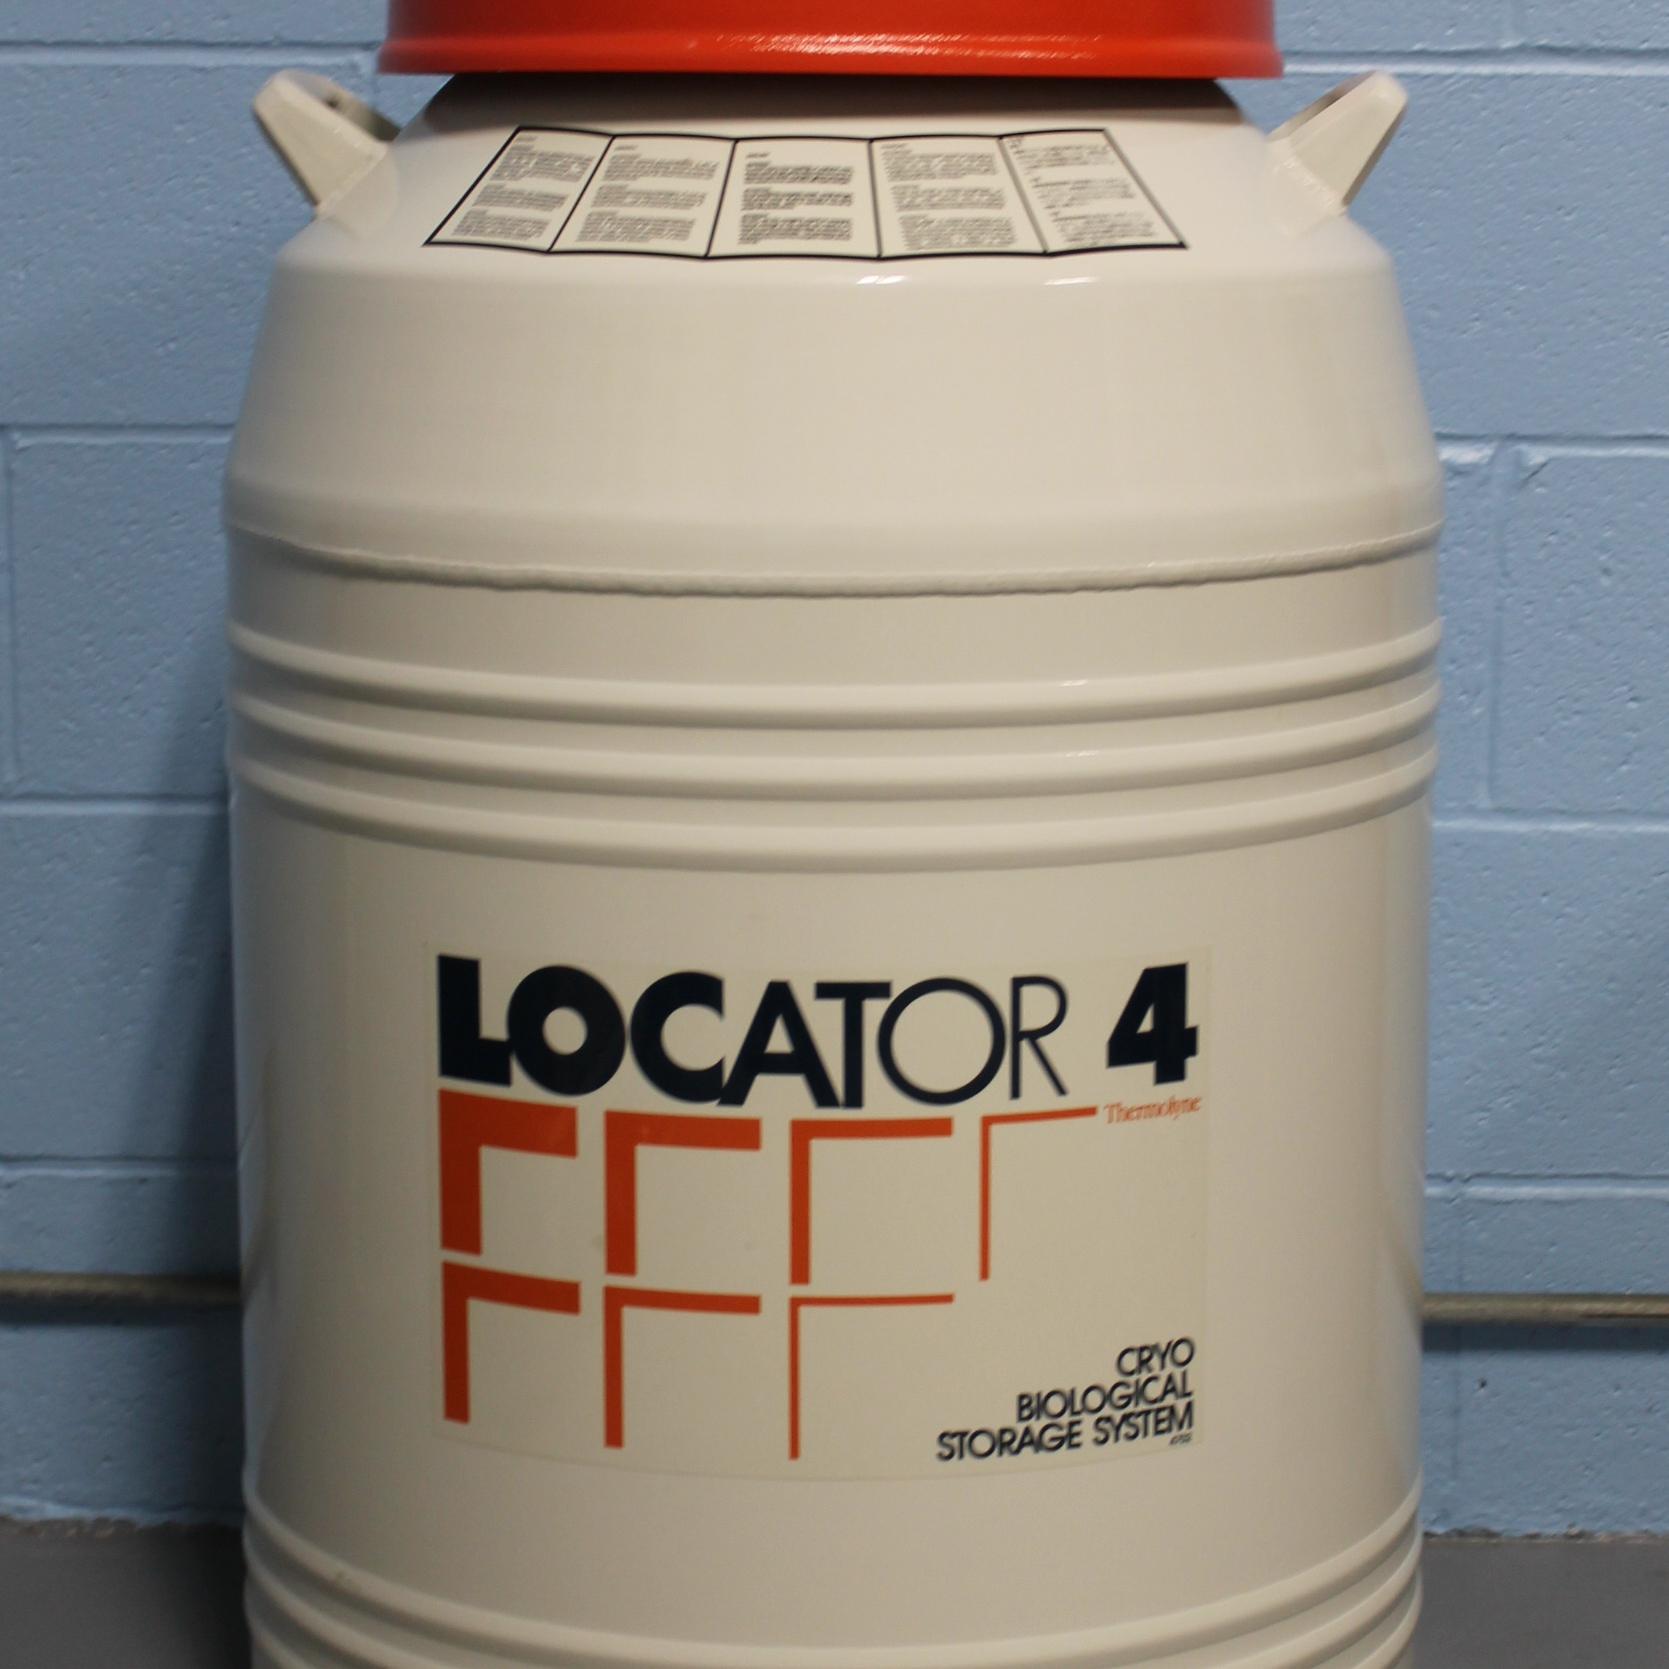 Thermolyne Locator 4 Cryobiological Storage Vessel Unit Image